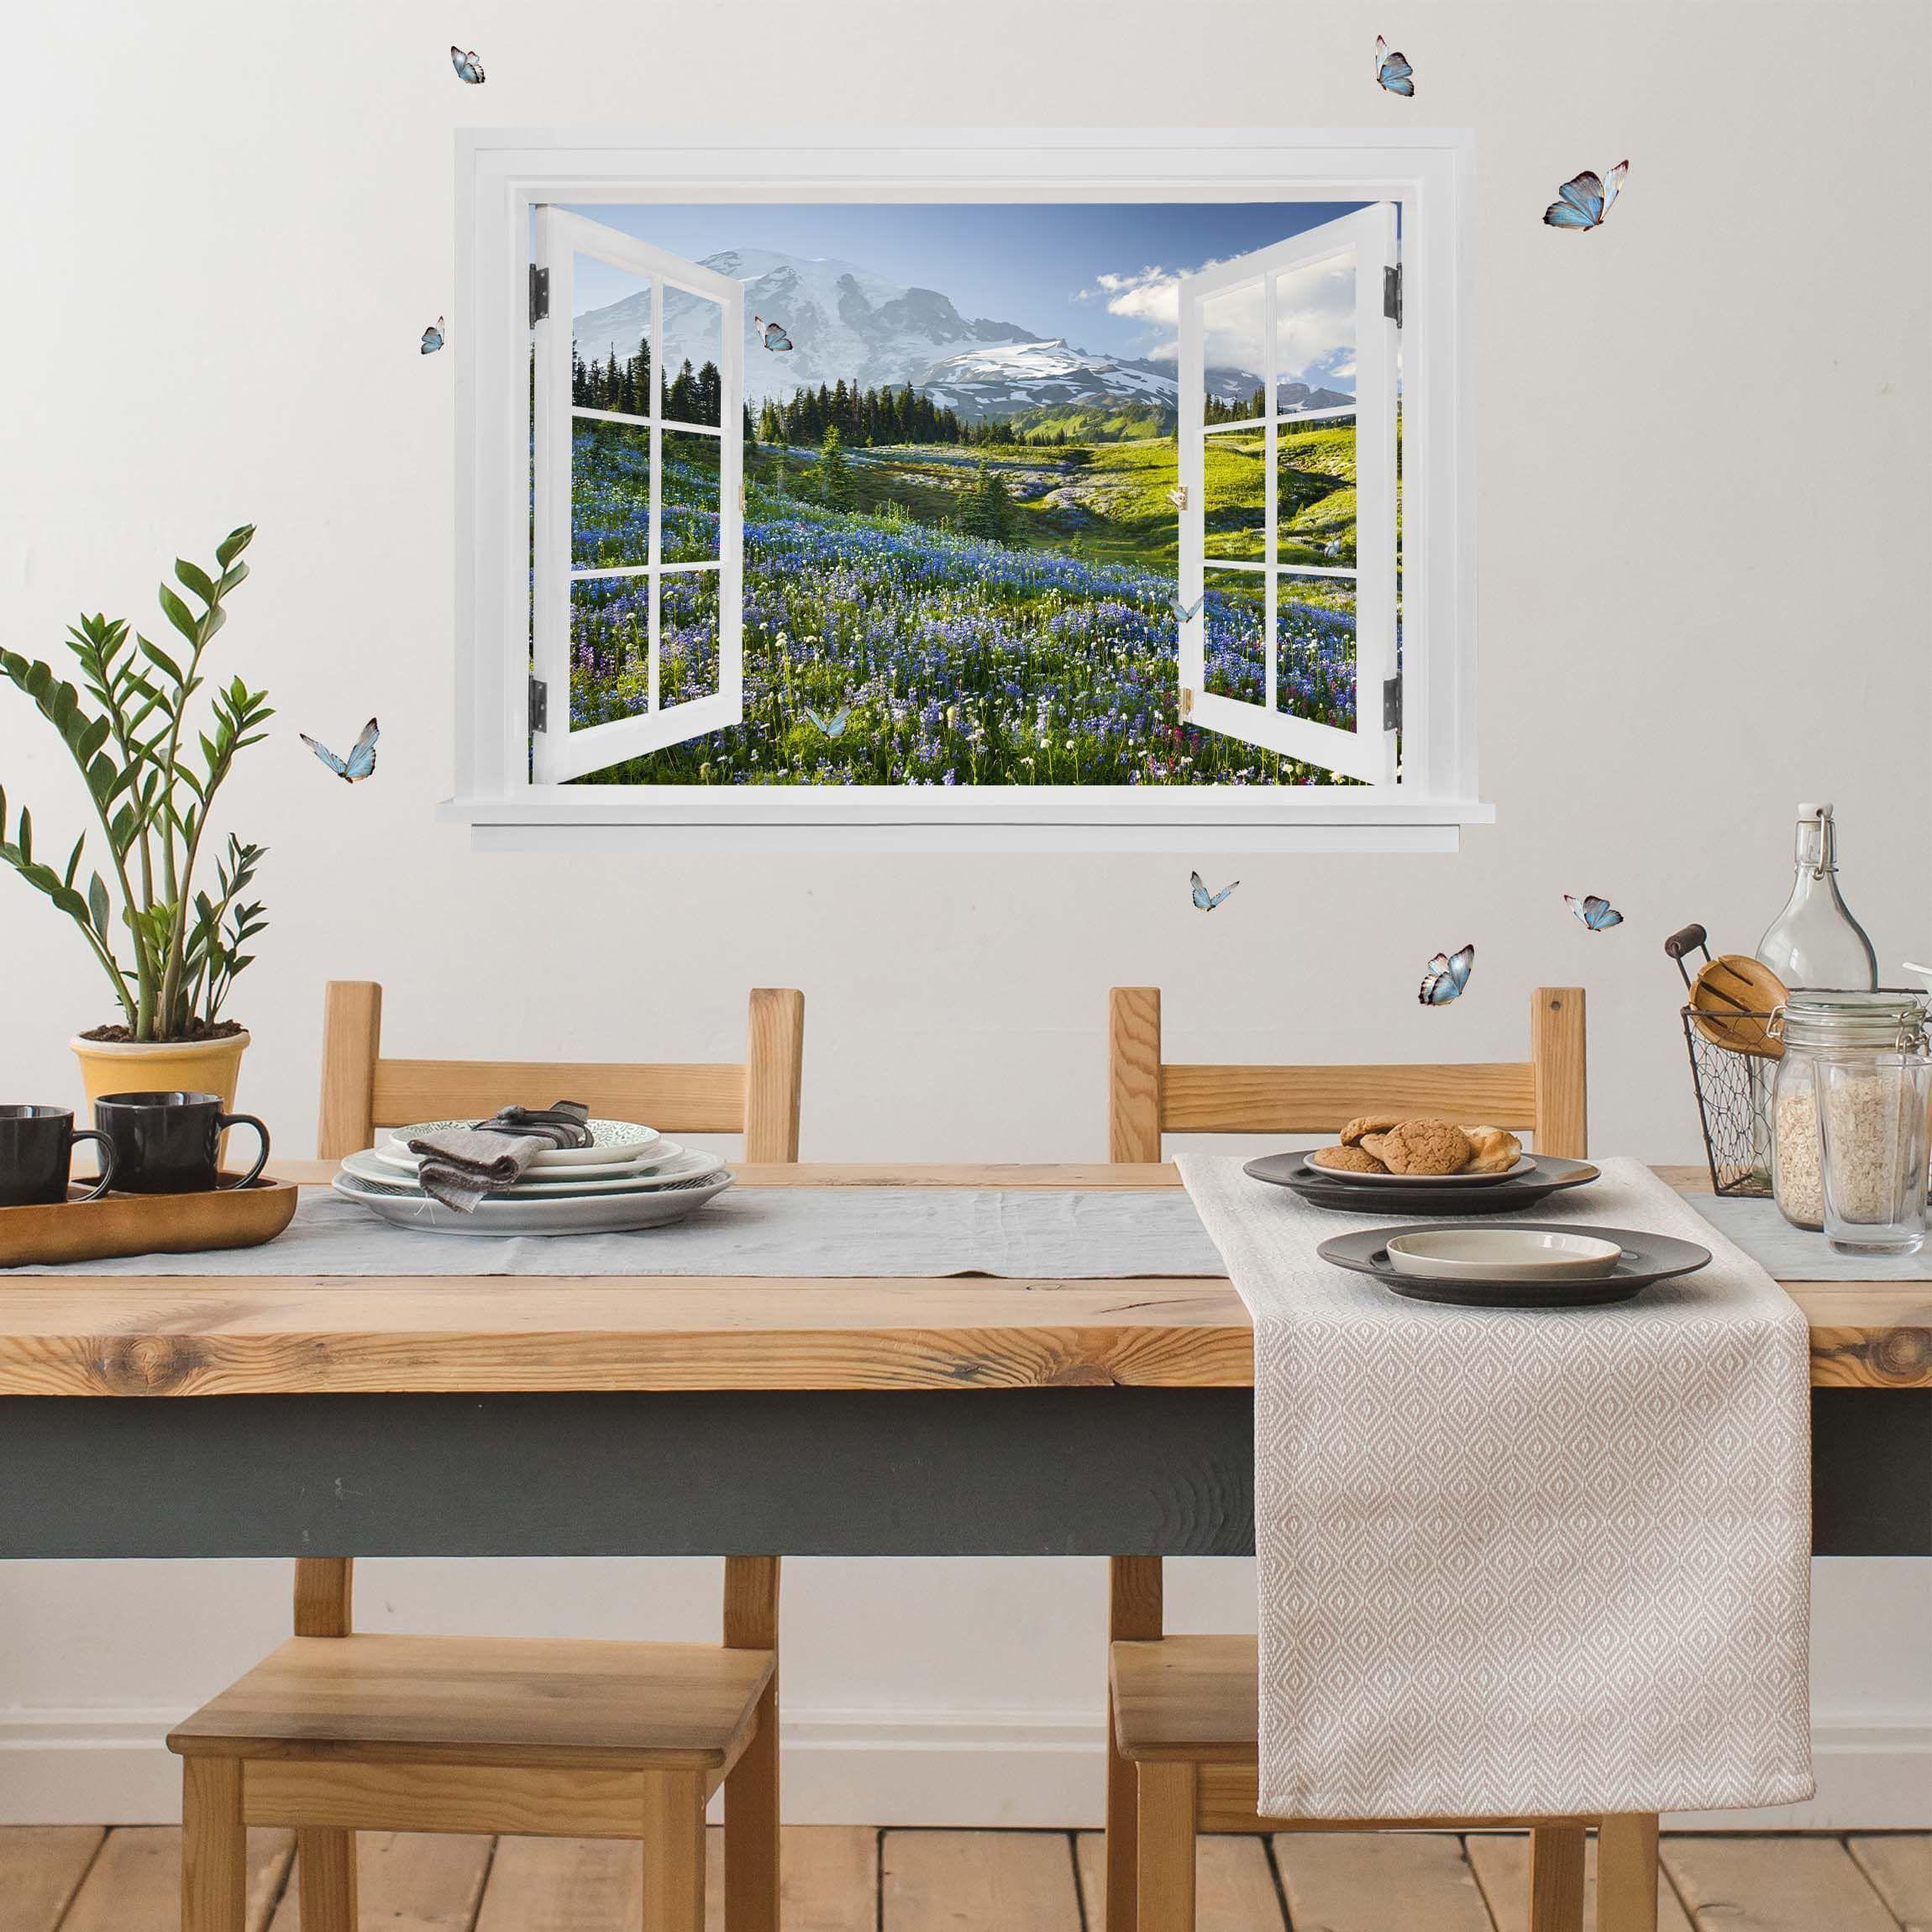 Adesivi Murali 3d Grandi.Trompe L Oeil Adesivi Murali Finestra Aperta Su Campo Di